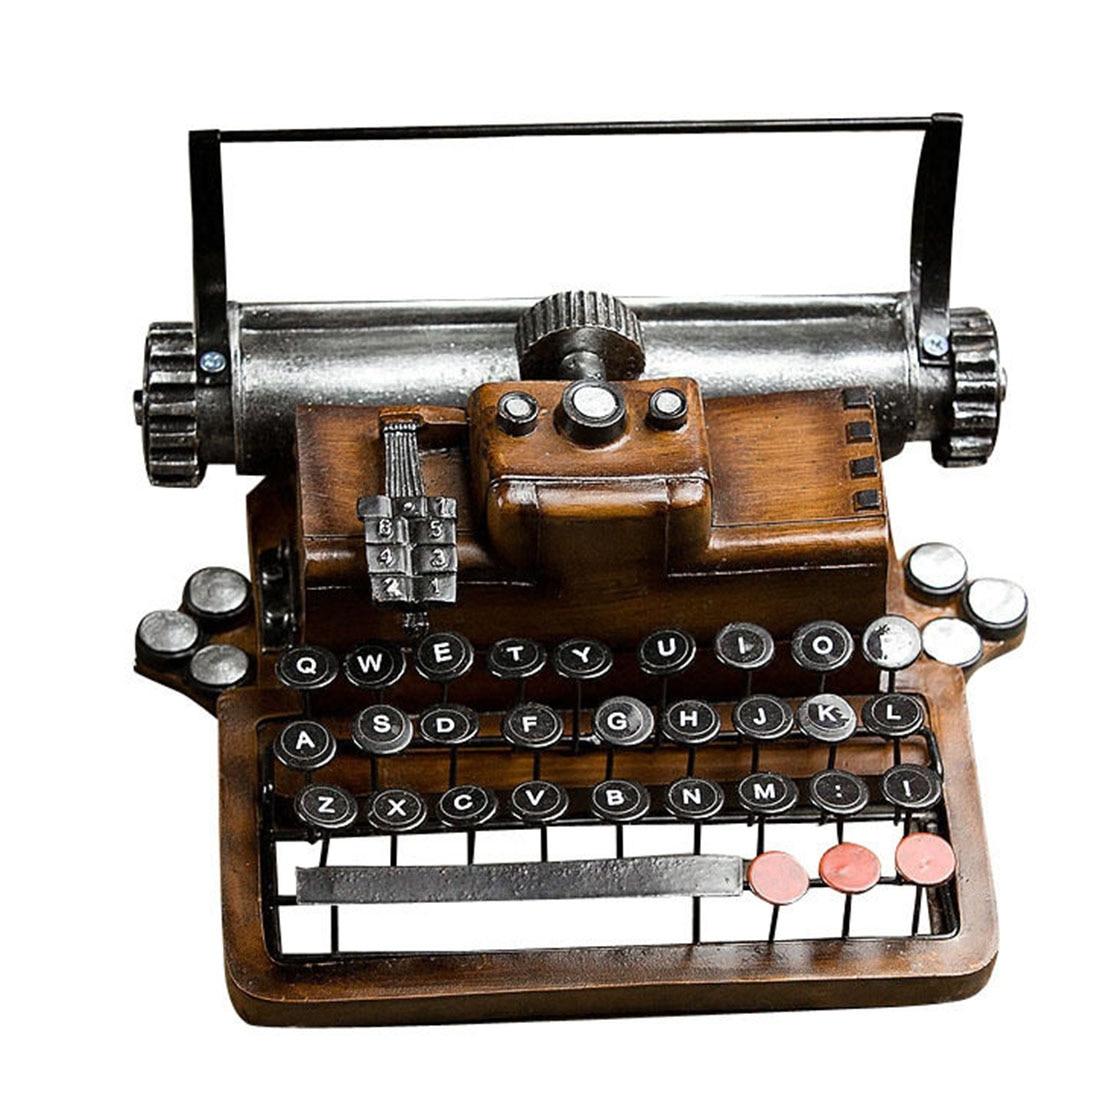 Retro Metal Typewriter Model Home Decor Crafts Objects Vintage Handicrafts Antique Typing Machine Home Decoration Crafts Gift